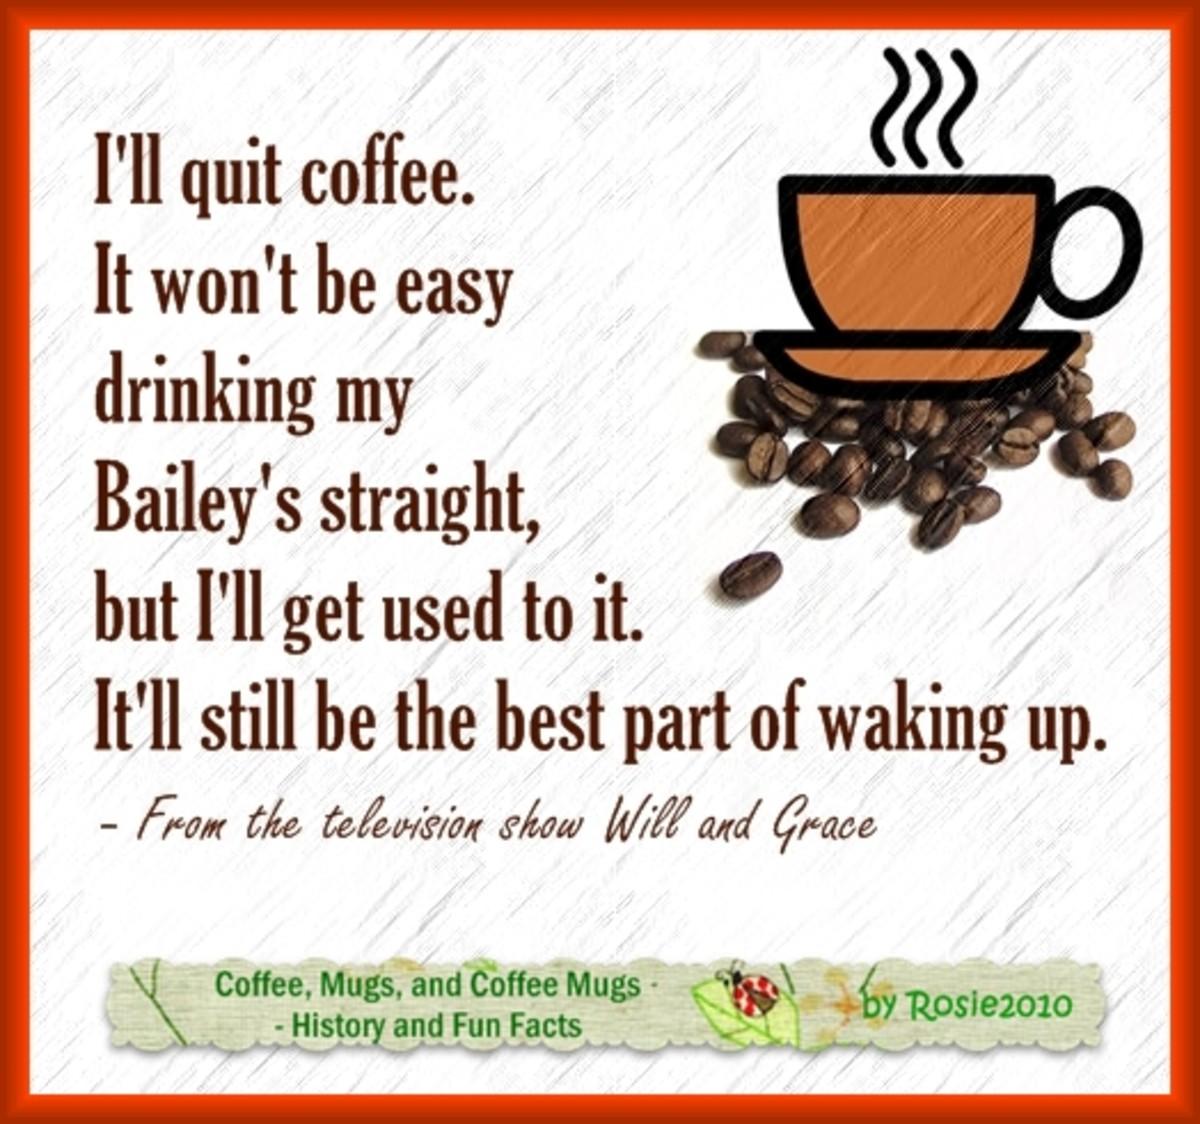 Coffee, Mugs, and Coffee Mugs - History and Fun Facts